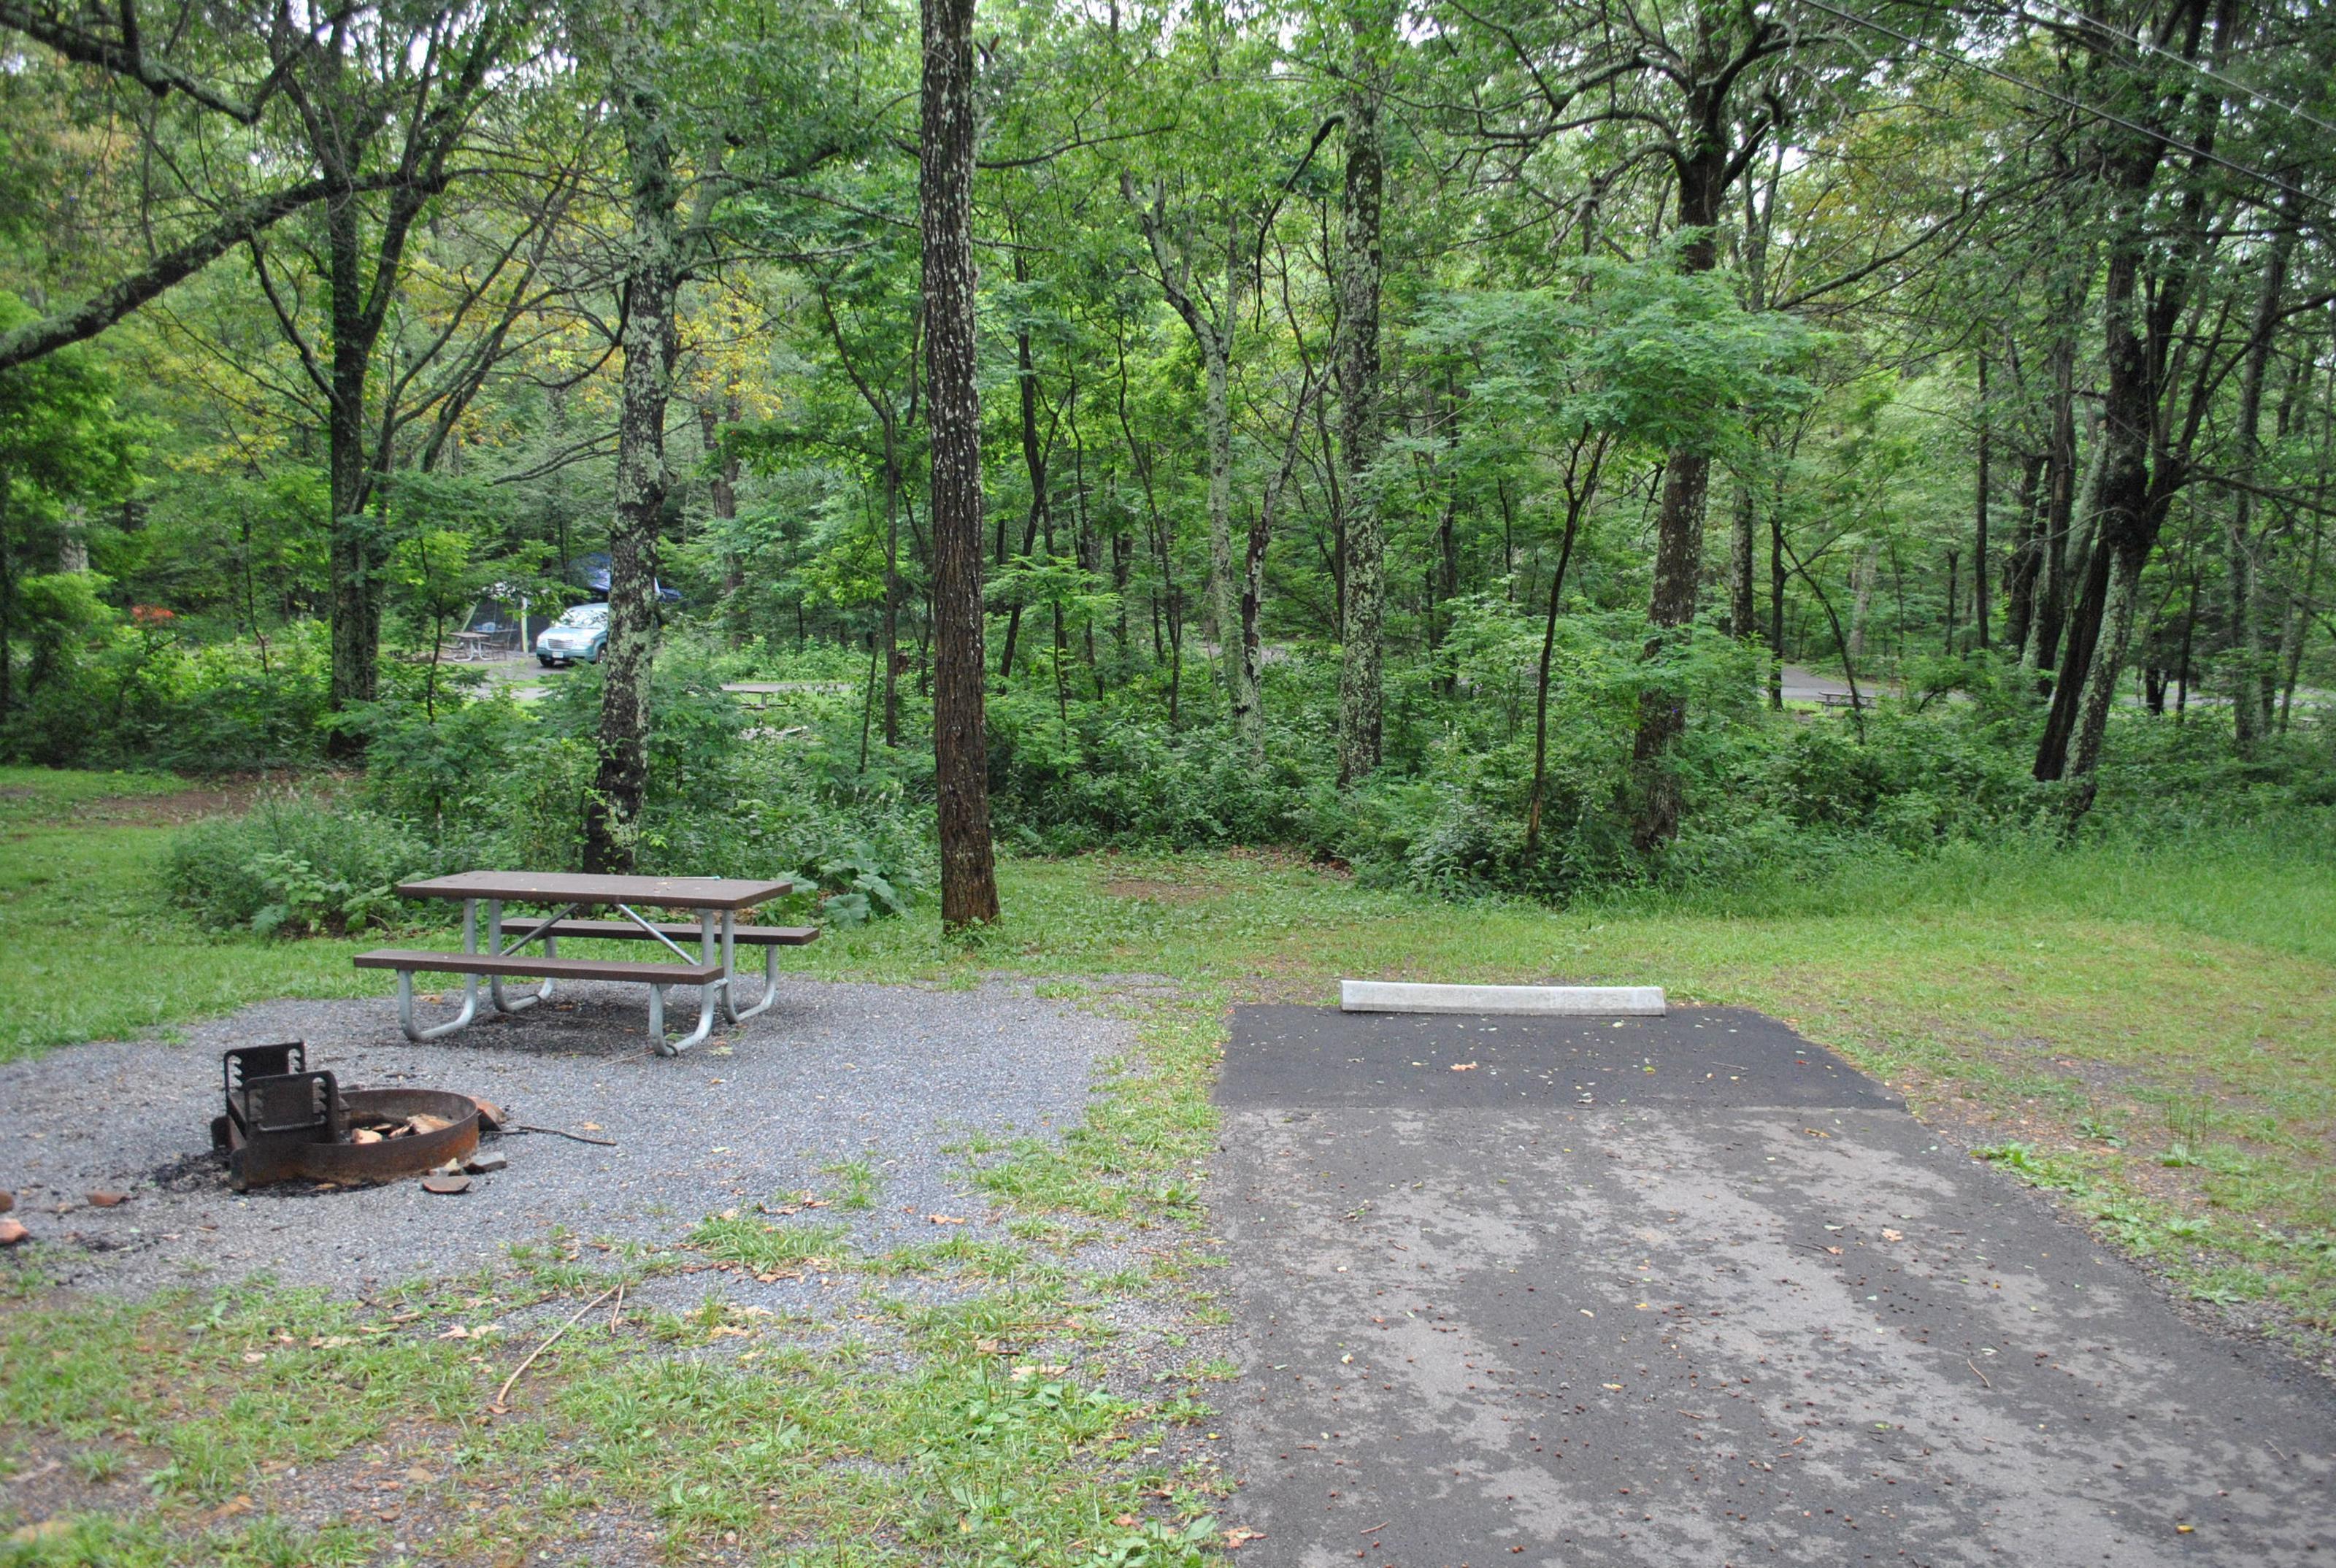 Mathews Arm Campground – Site A064